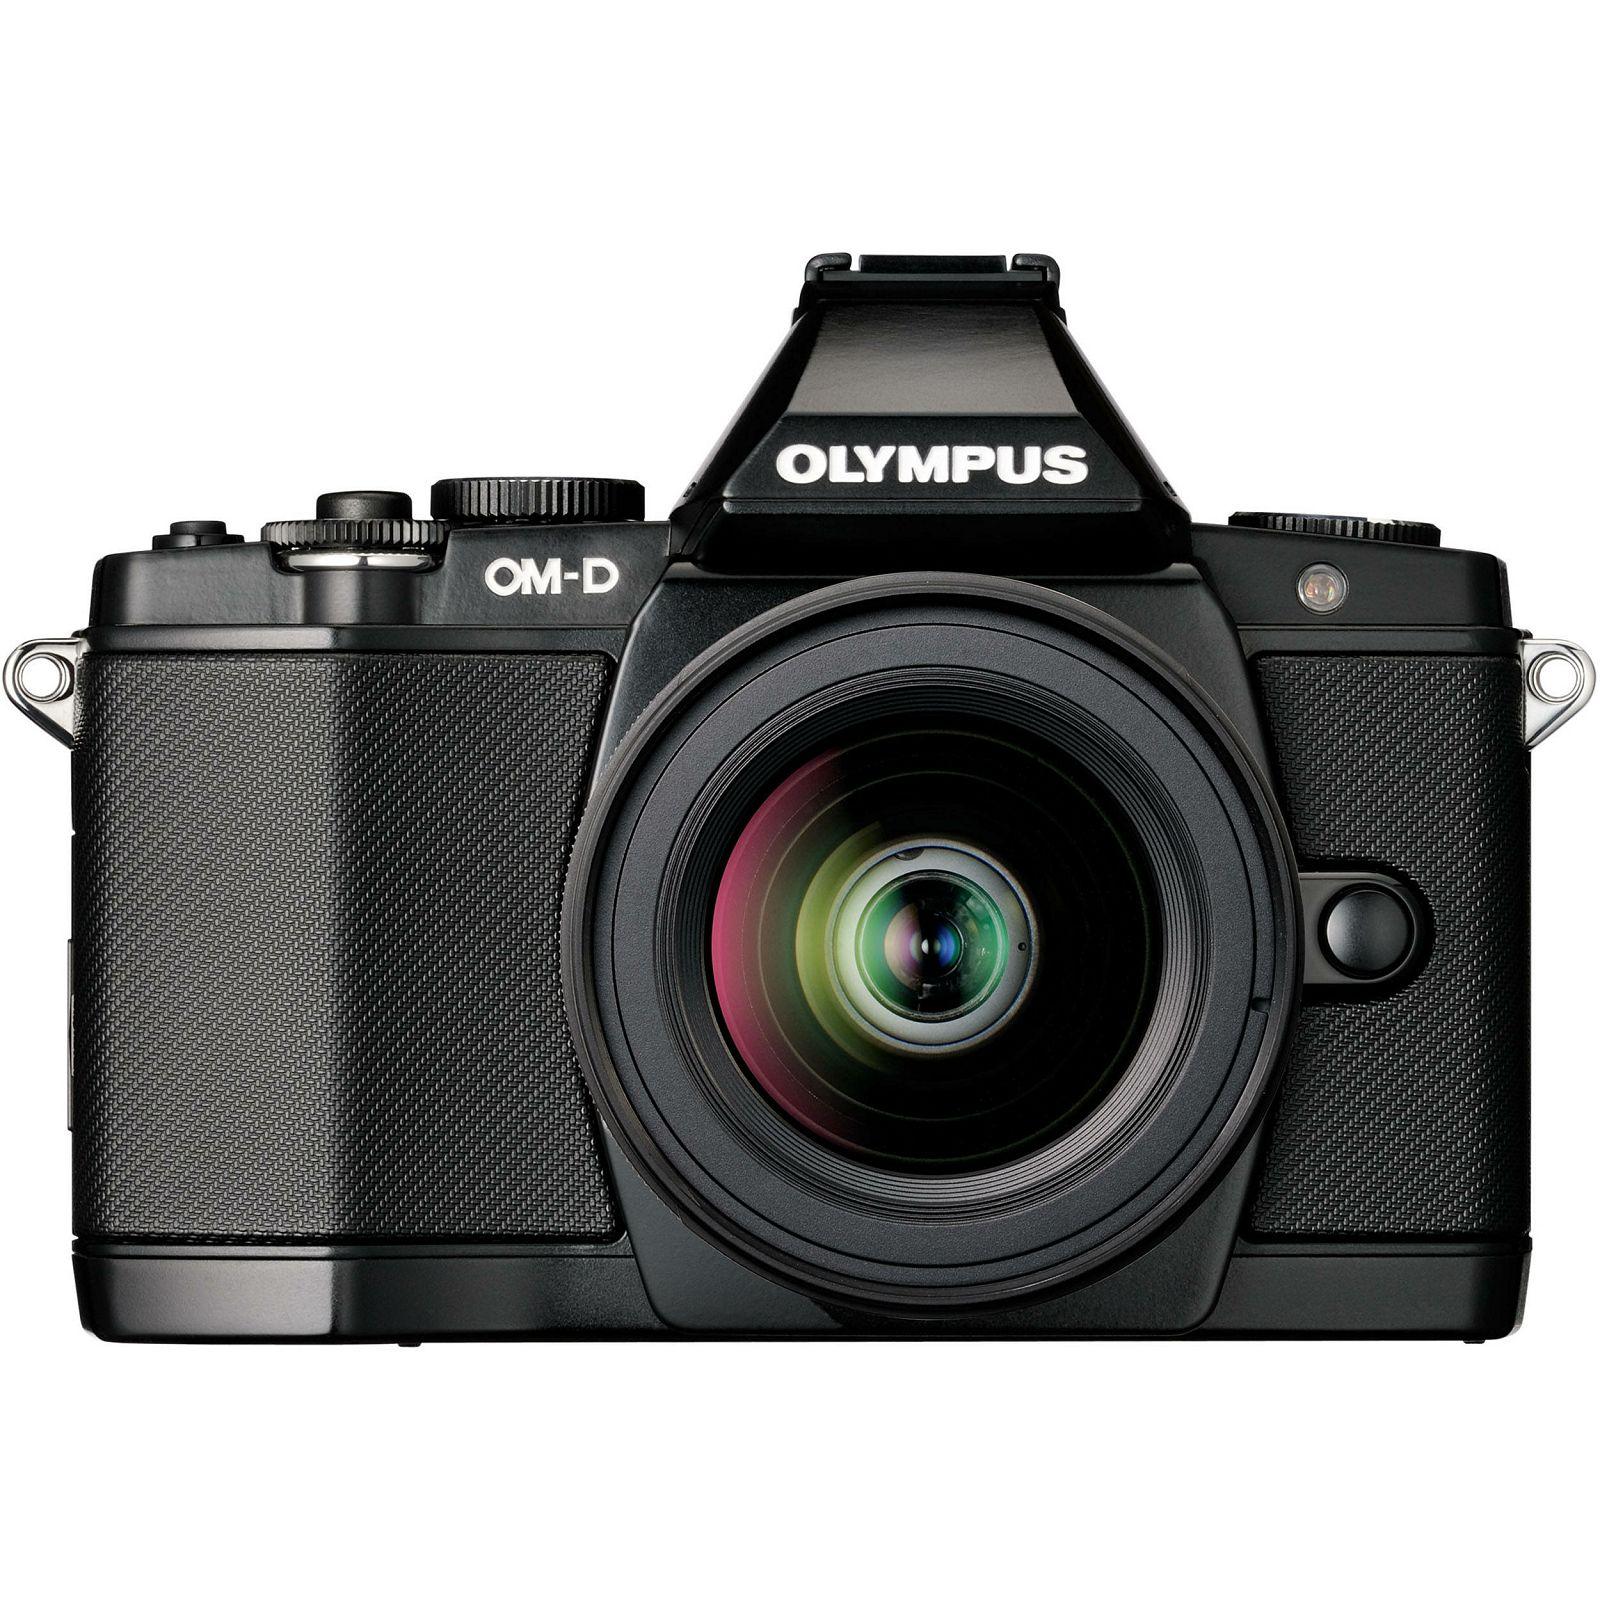 Olympus E-M5 II + 12-50mm Black crni E-M5II 1250 Kit blk/blk 12-50 E-M5 Mark II + EZ-M1250 black incl. Charger + Battery Micro Four Thirds MFT - OM-D Camera digitalni fotoaparat V207042BE000